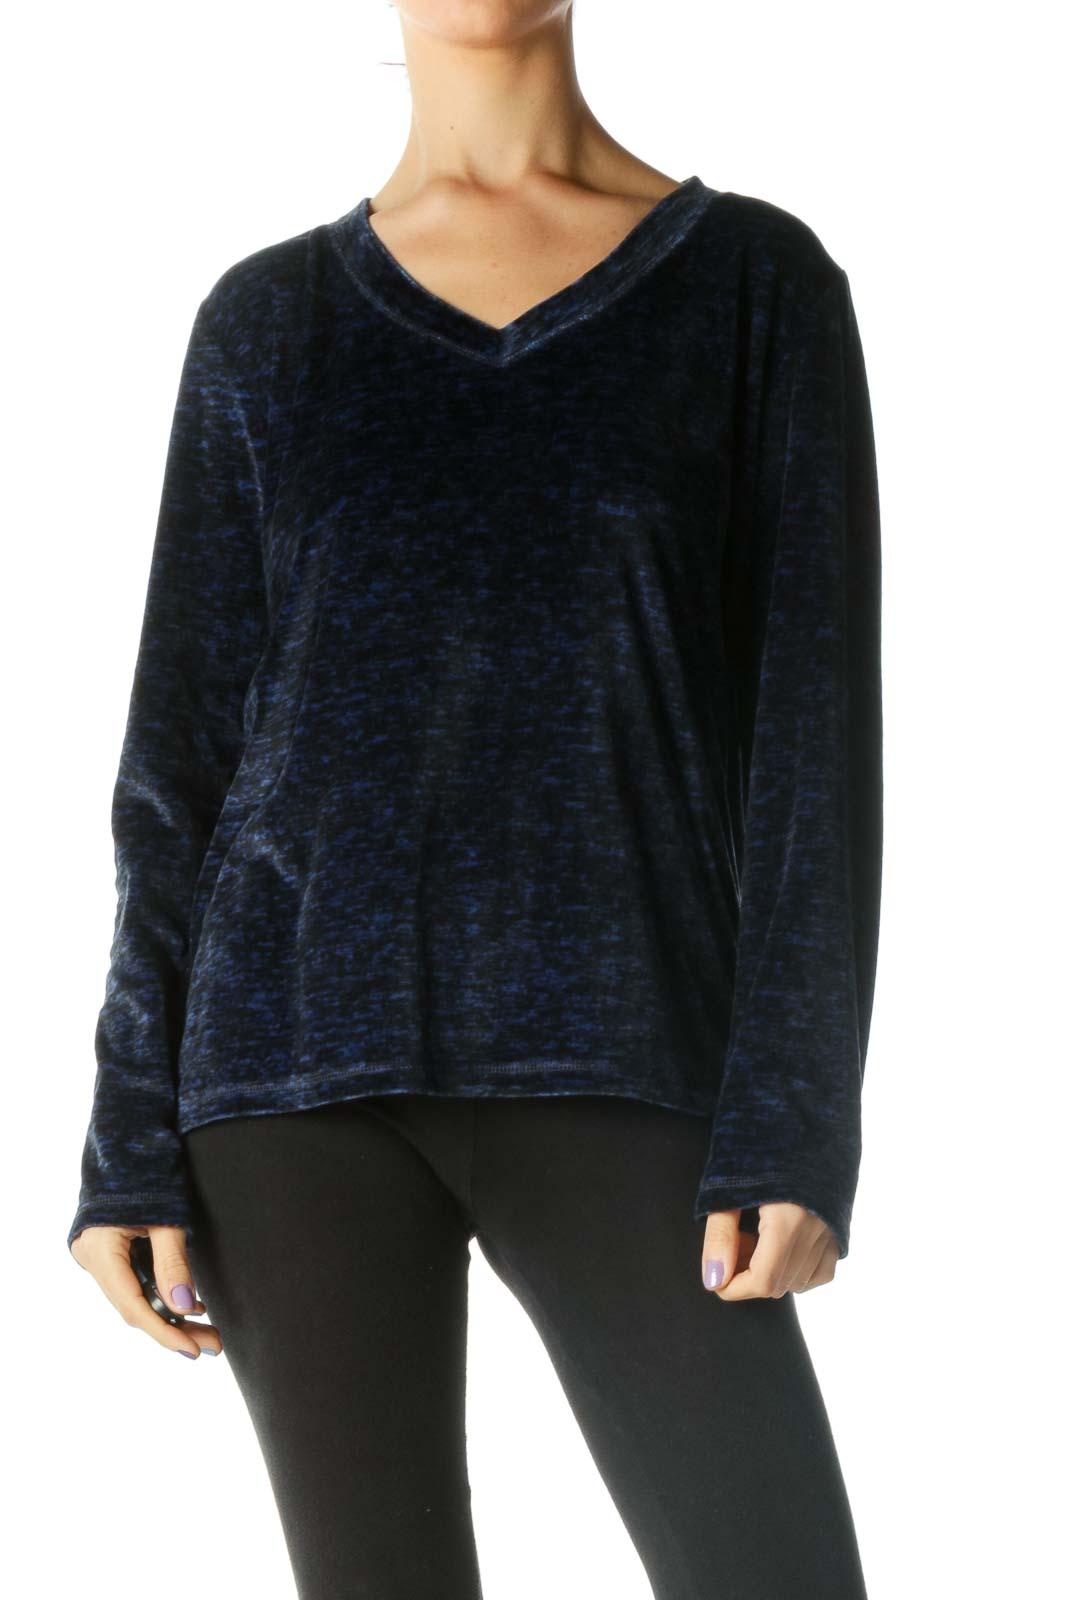 Blue and Black Soft Long Sleeve V-neck Knit Top